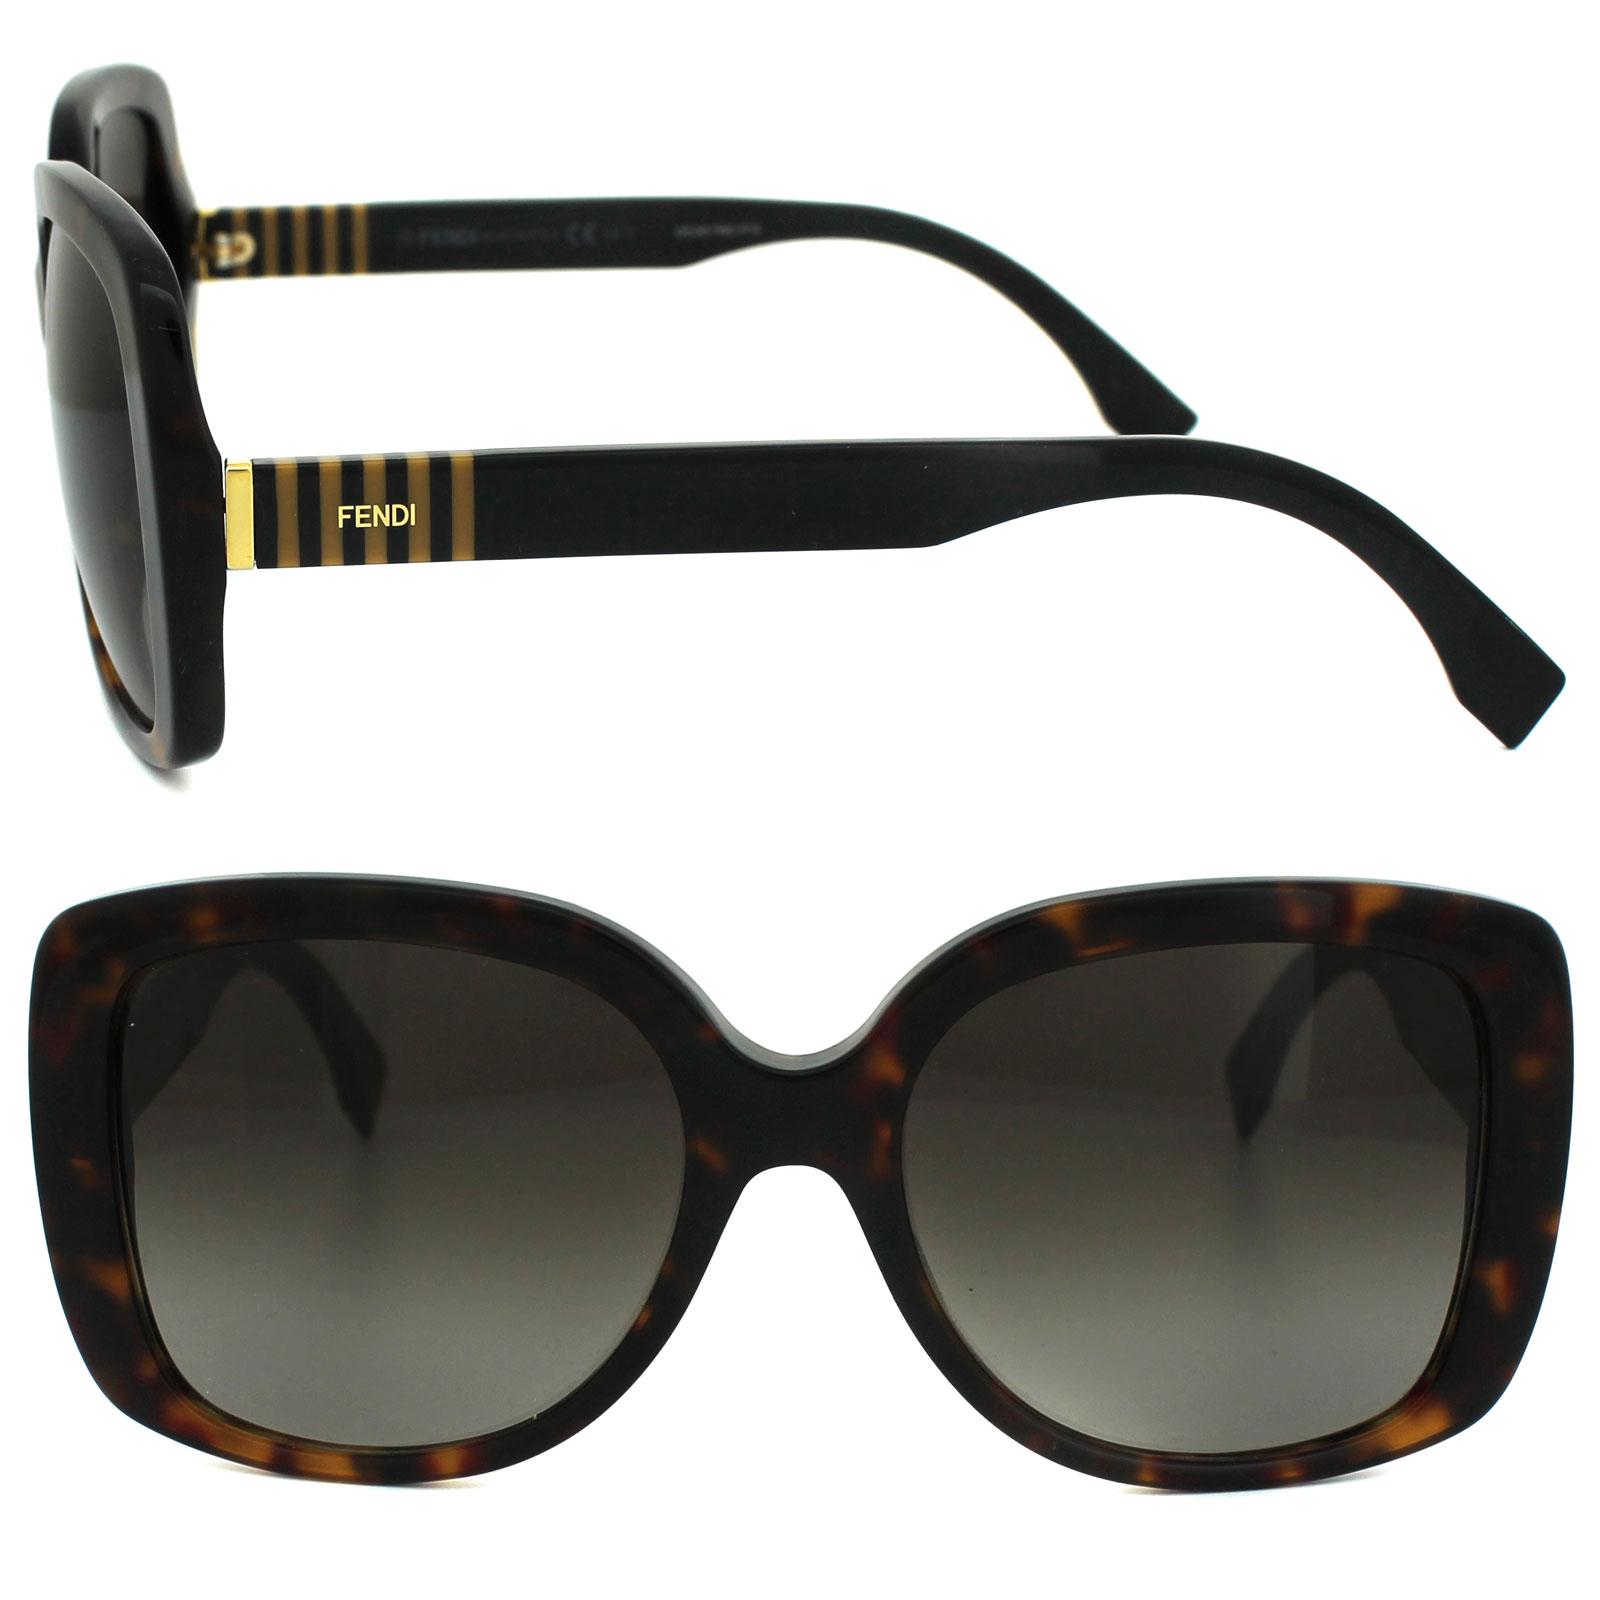 Cheap Fendi Pequin Ff 0014 S Sunglasses Discounted Sunglasses